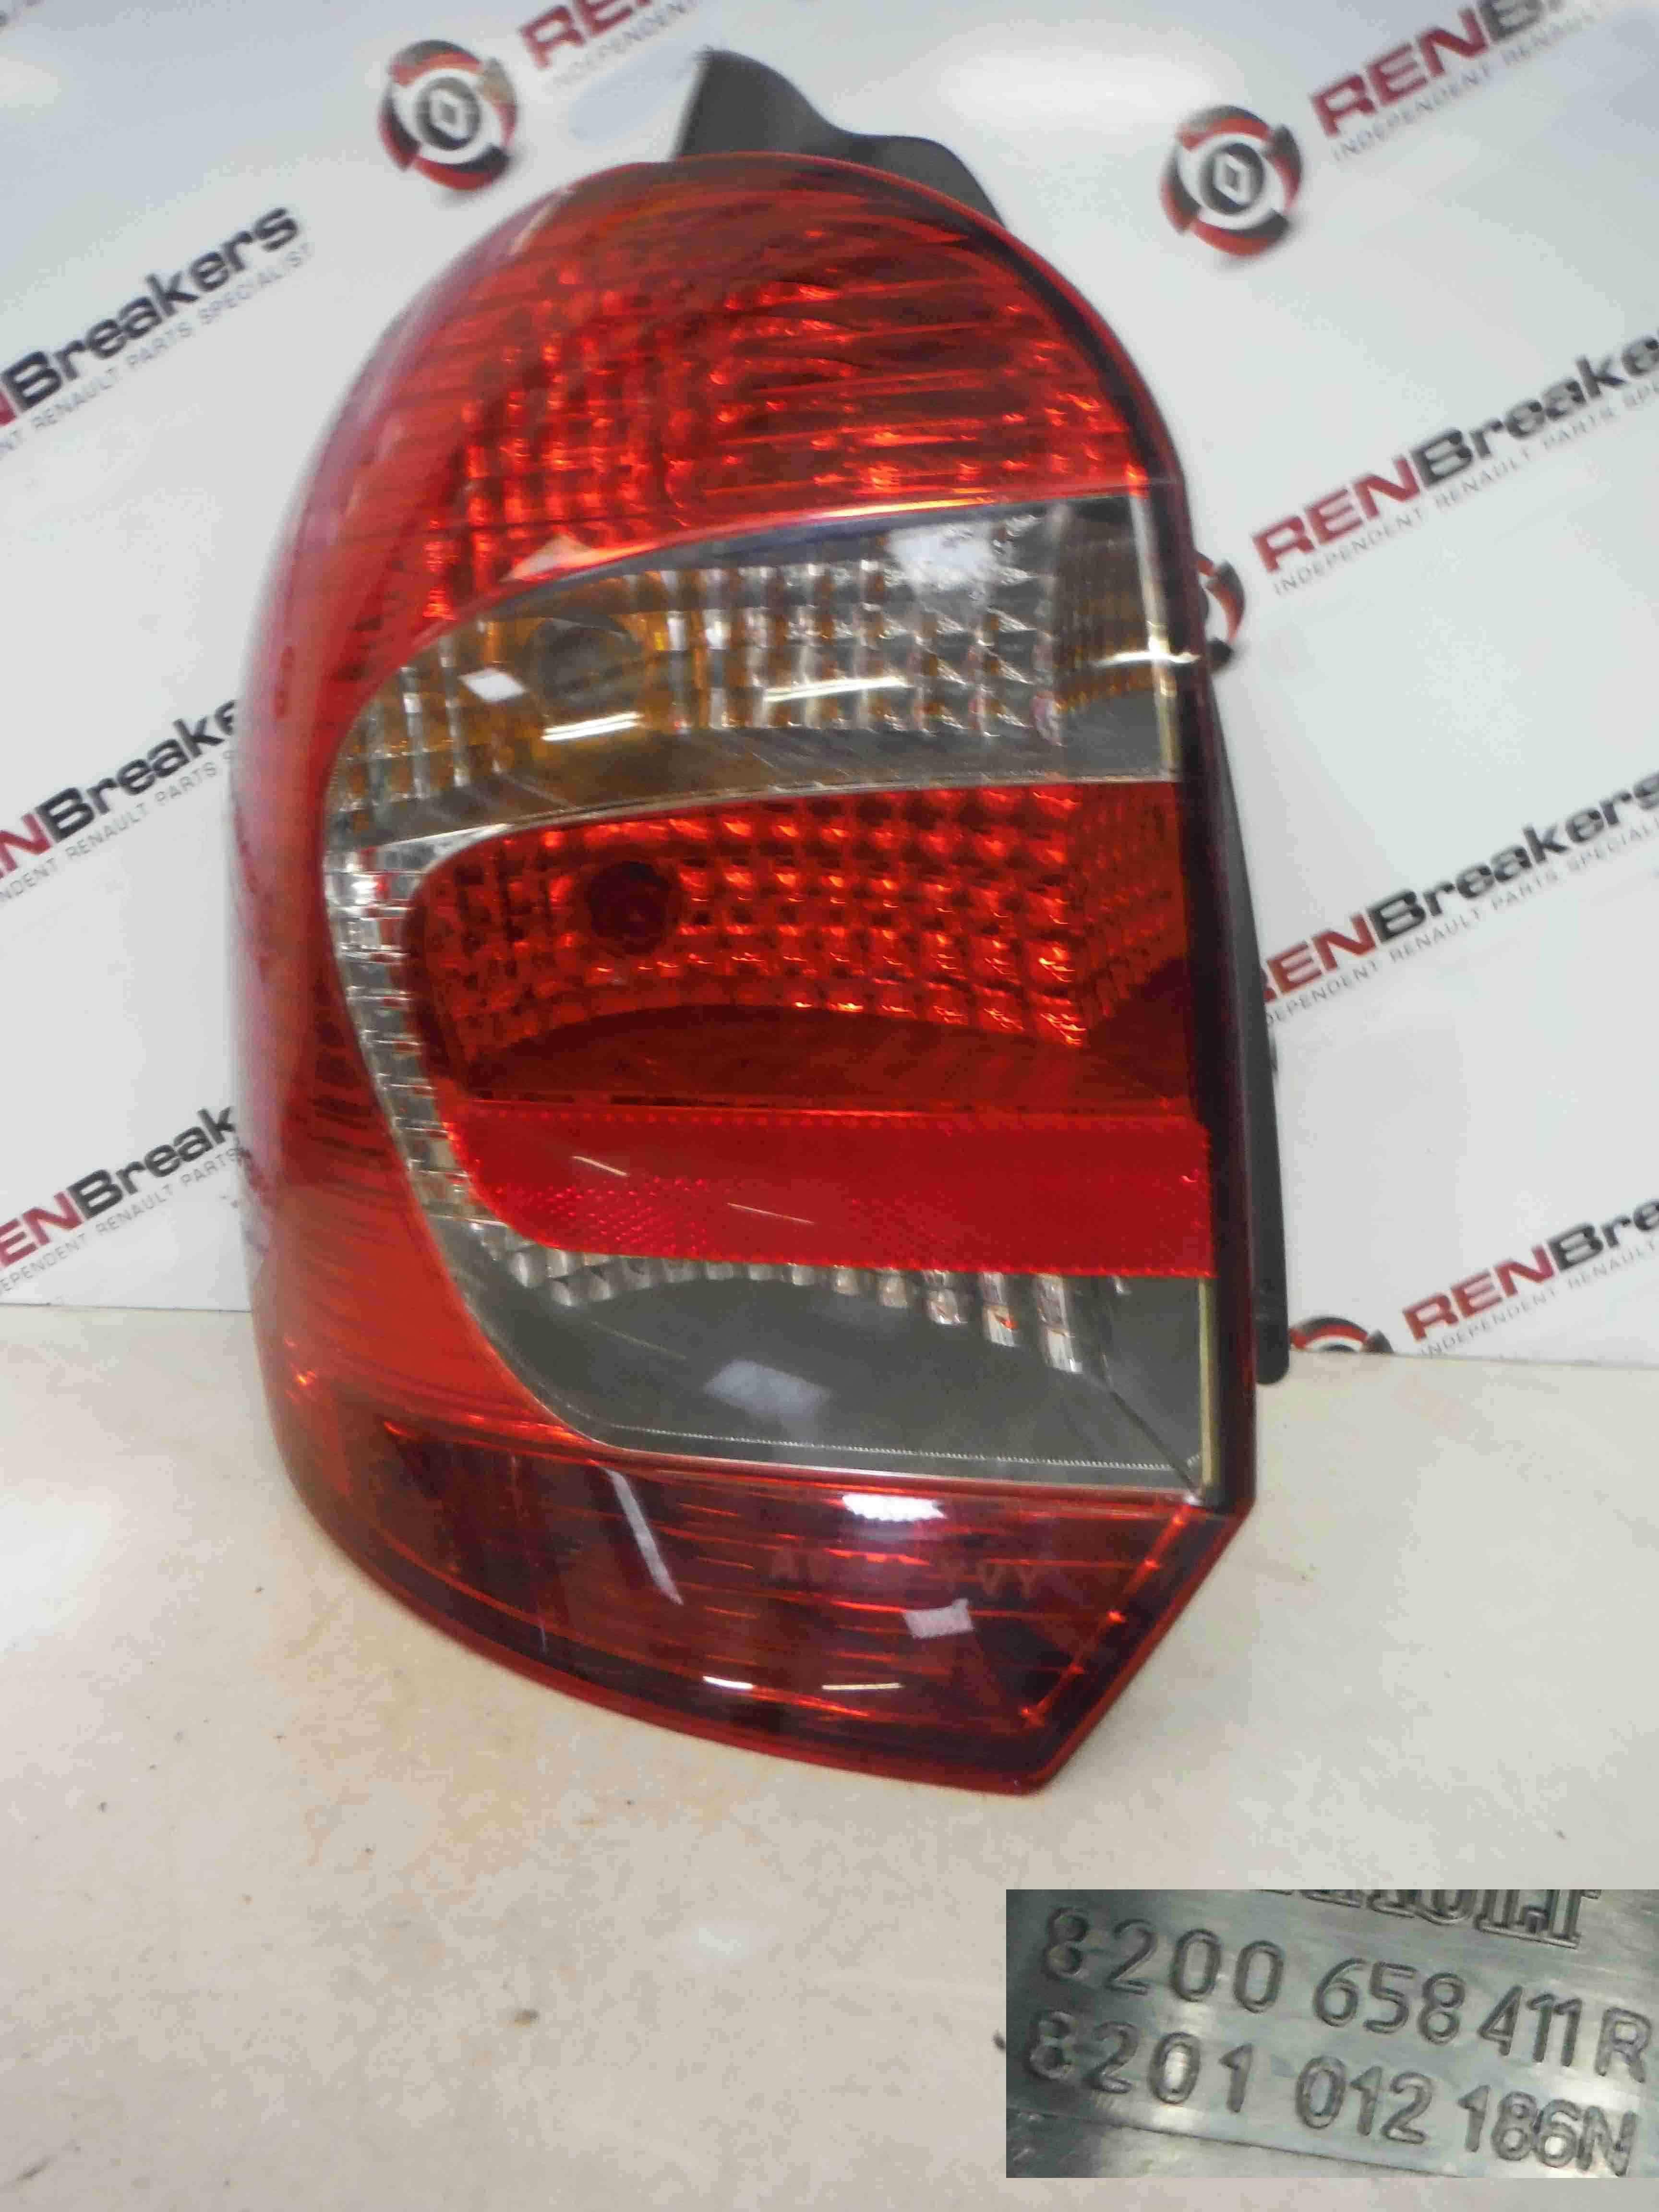 Renault Grand Modus 2008-2012 Passenger NSR Rear Light Lenz 8200658411